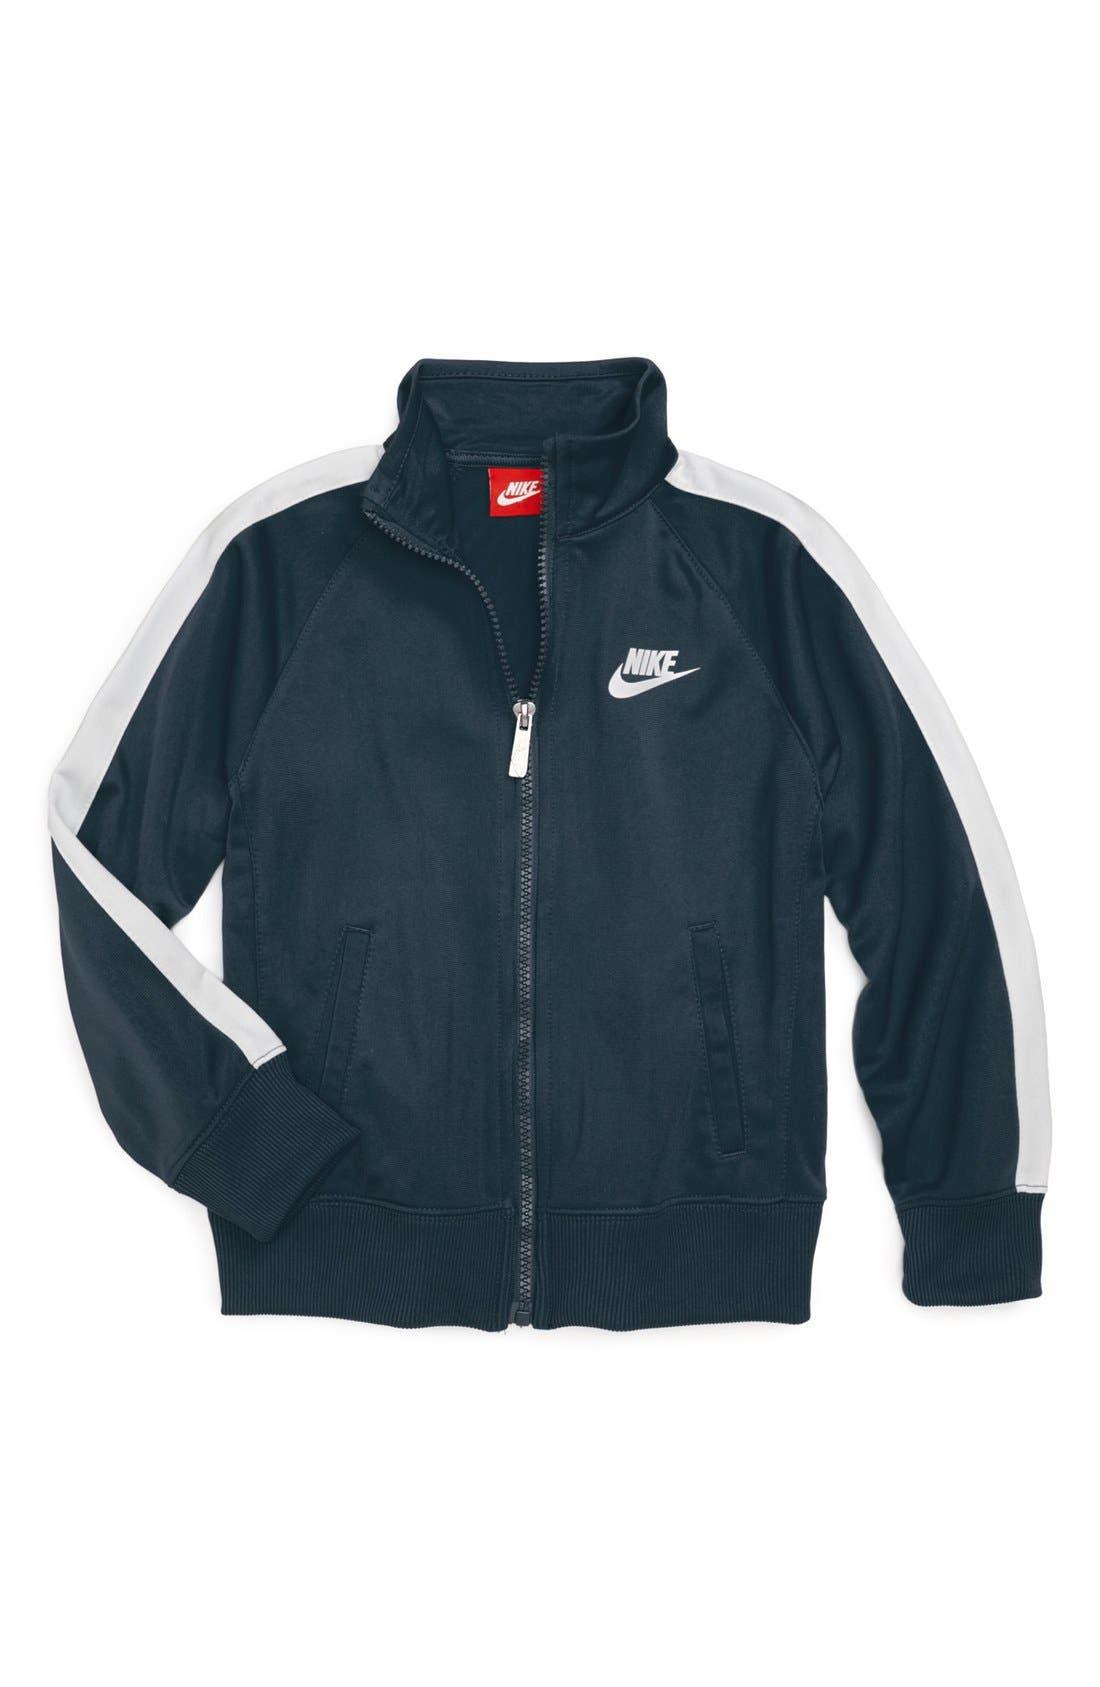 Alternate Image 1 Selected - Nike 'Futura' Jacket (Little Boys)